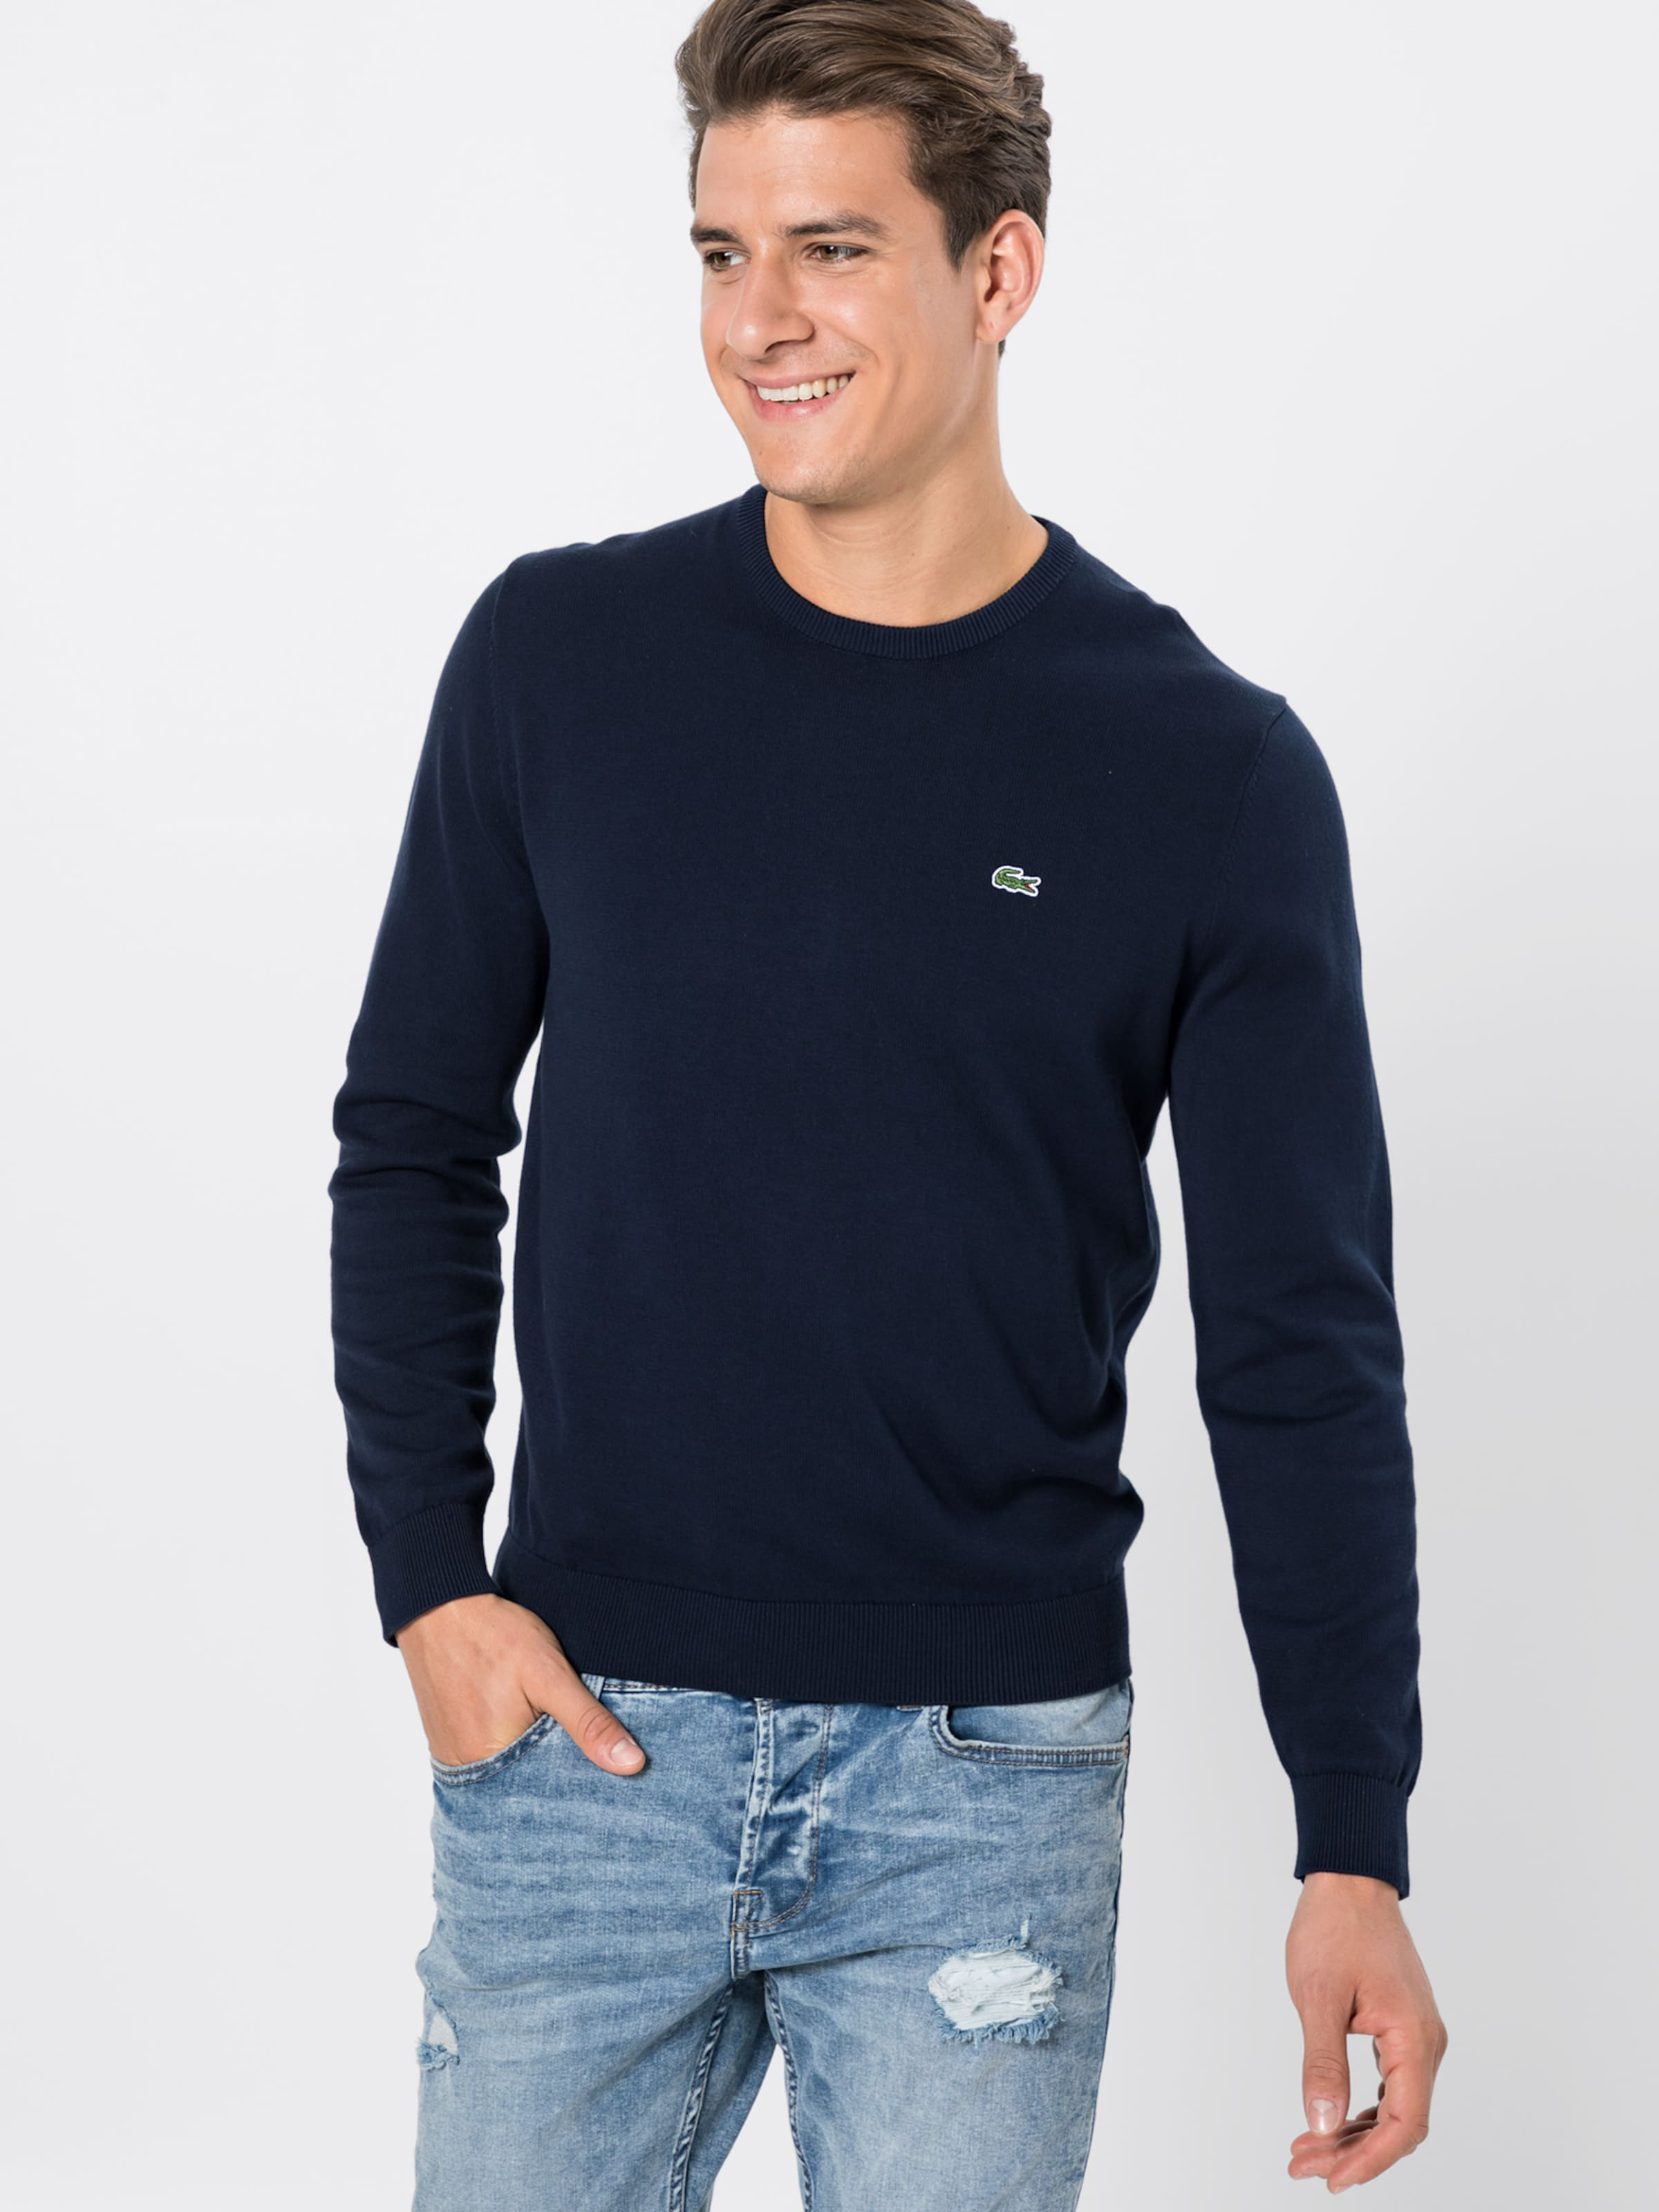 Pullover Nachtblau Nachtblau Pullover In Pullover In Lacoste Lacoste Lacoste Lacoste Nachtblau In KcFl1J